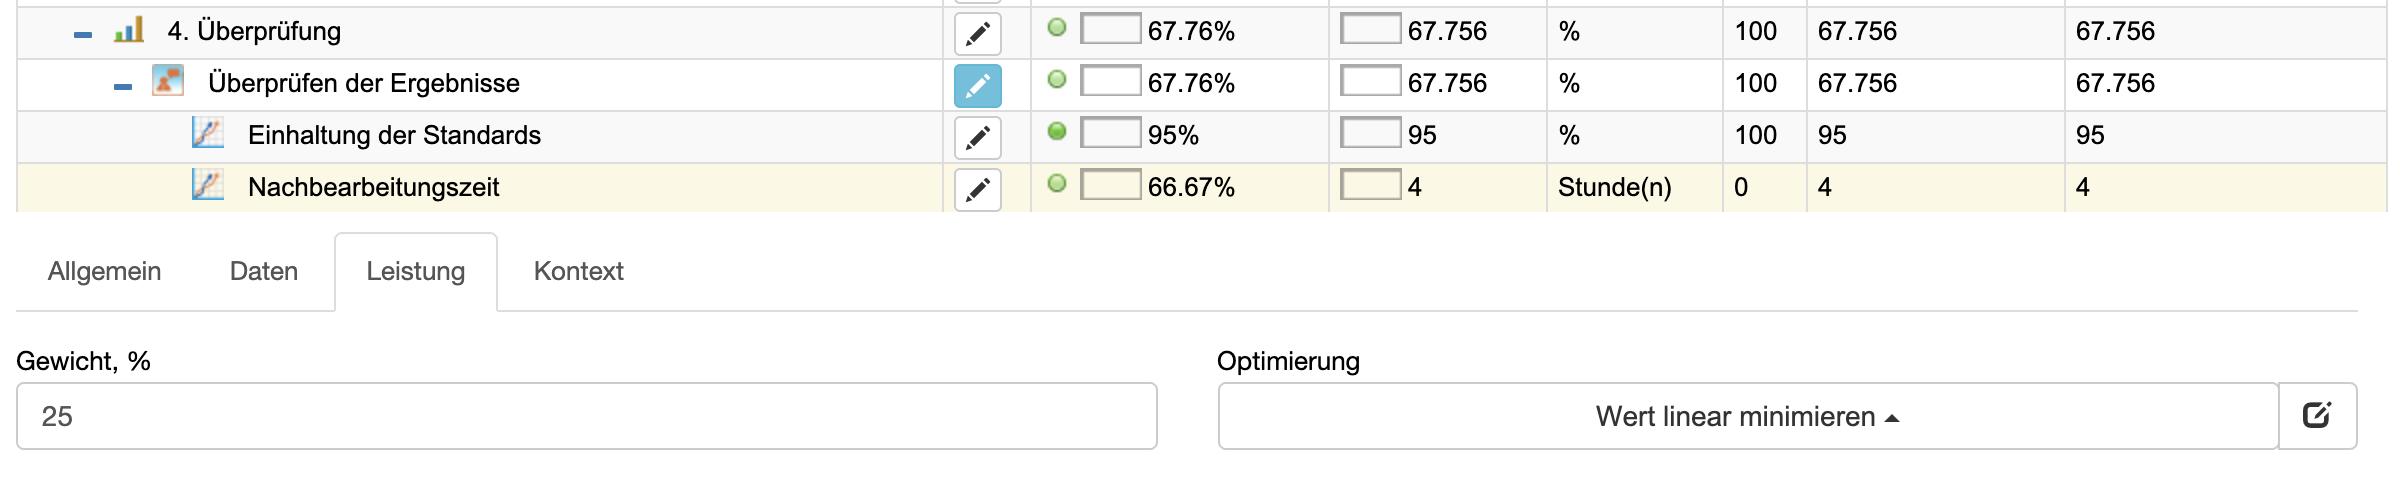 KPI: Nachbearbeitungszeit